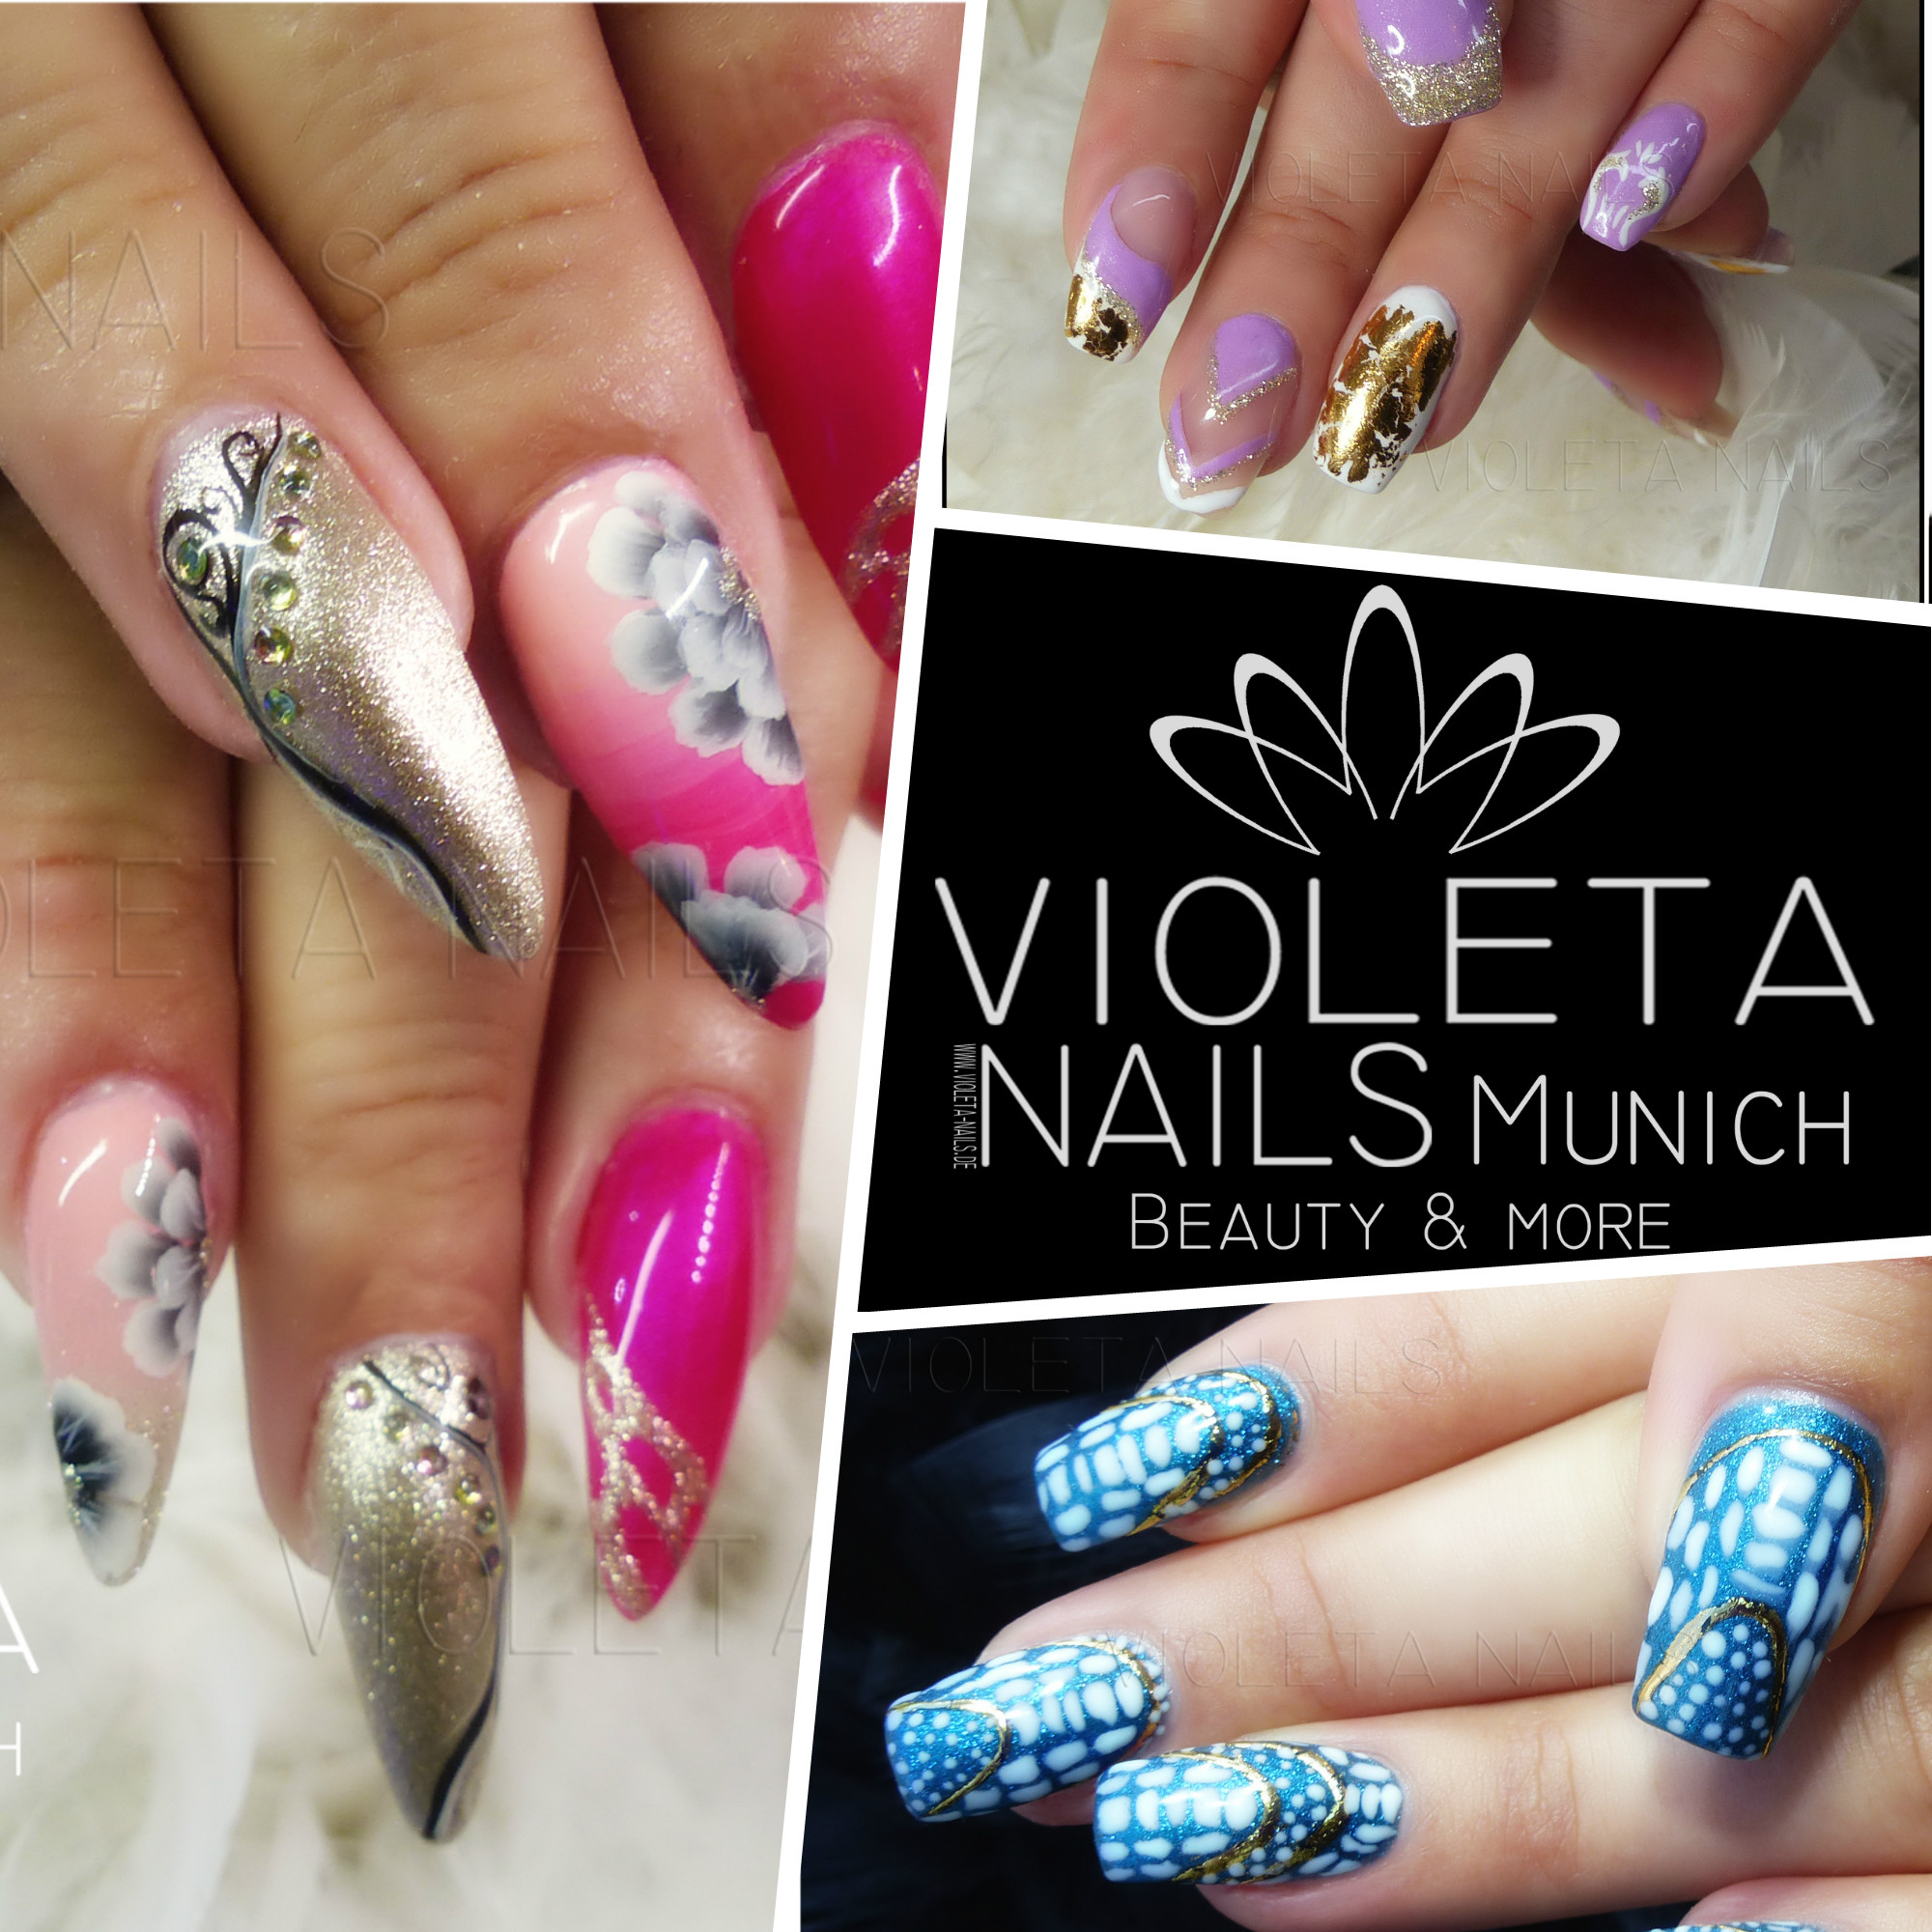 Ihr Nagelstudio In Munchen Nagelstudio Violeta Nails